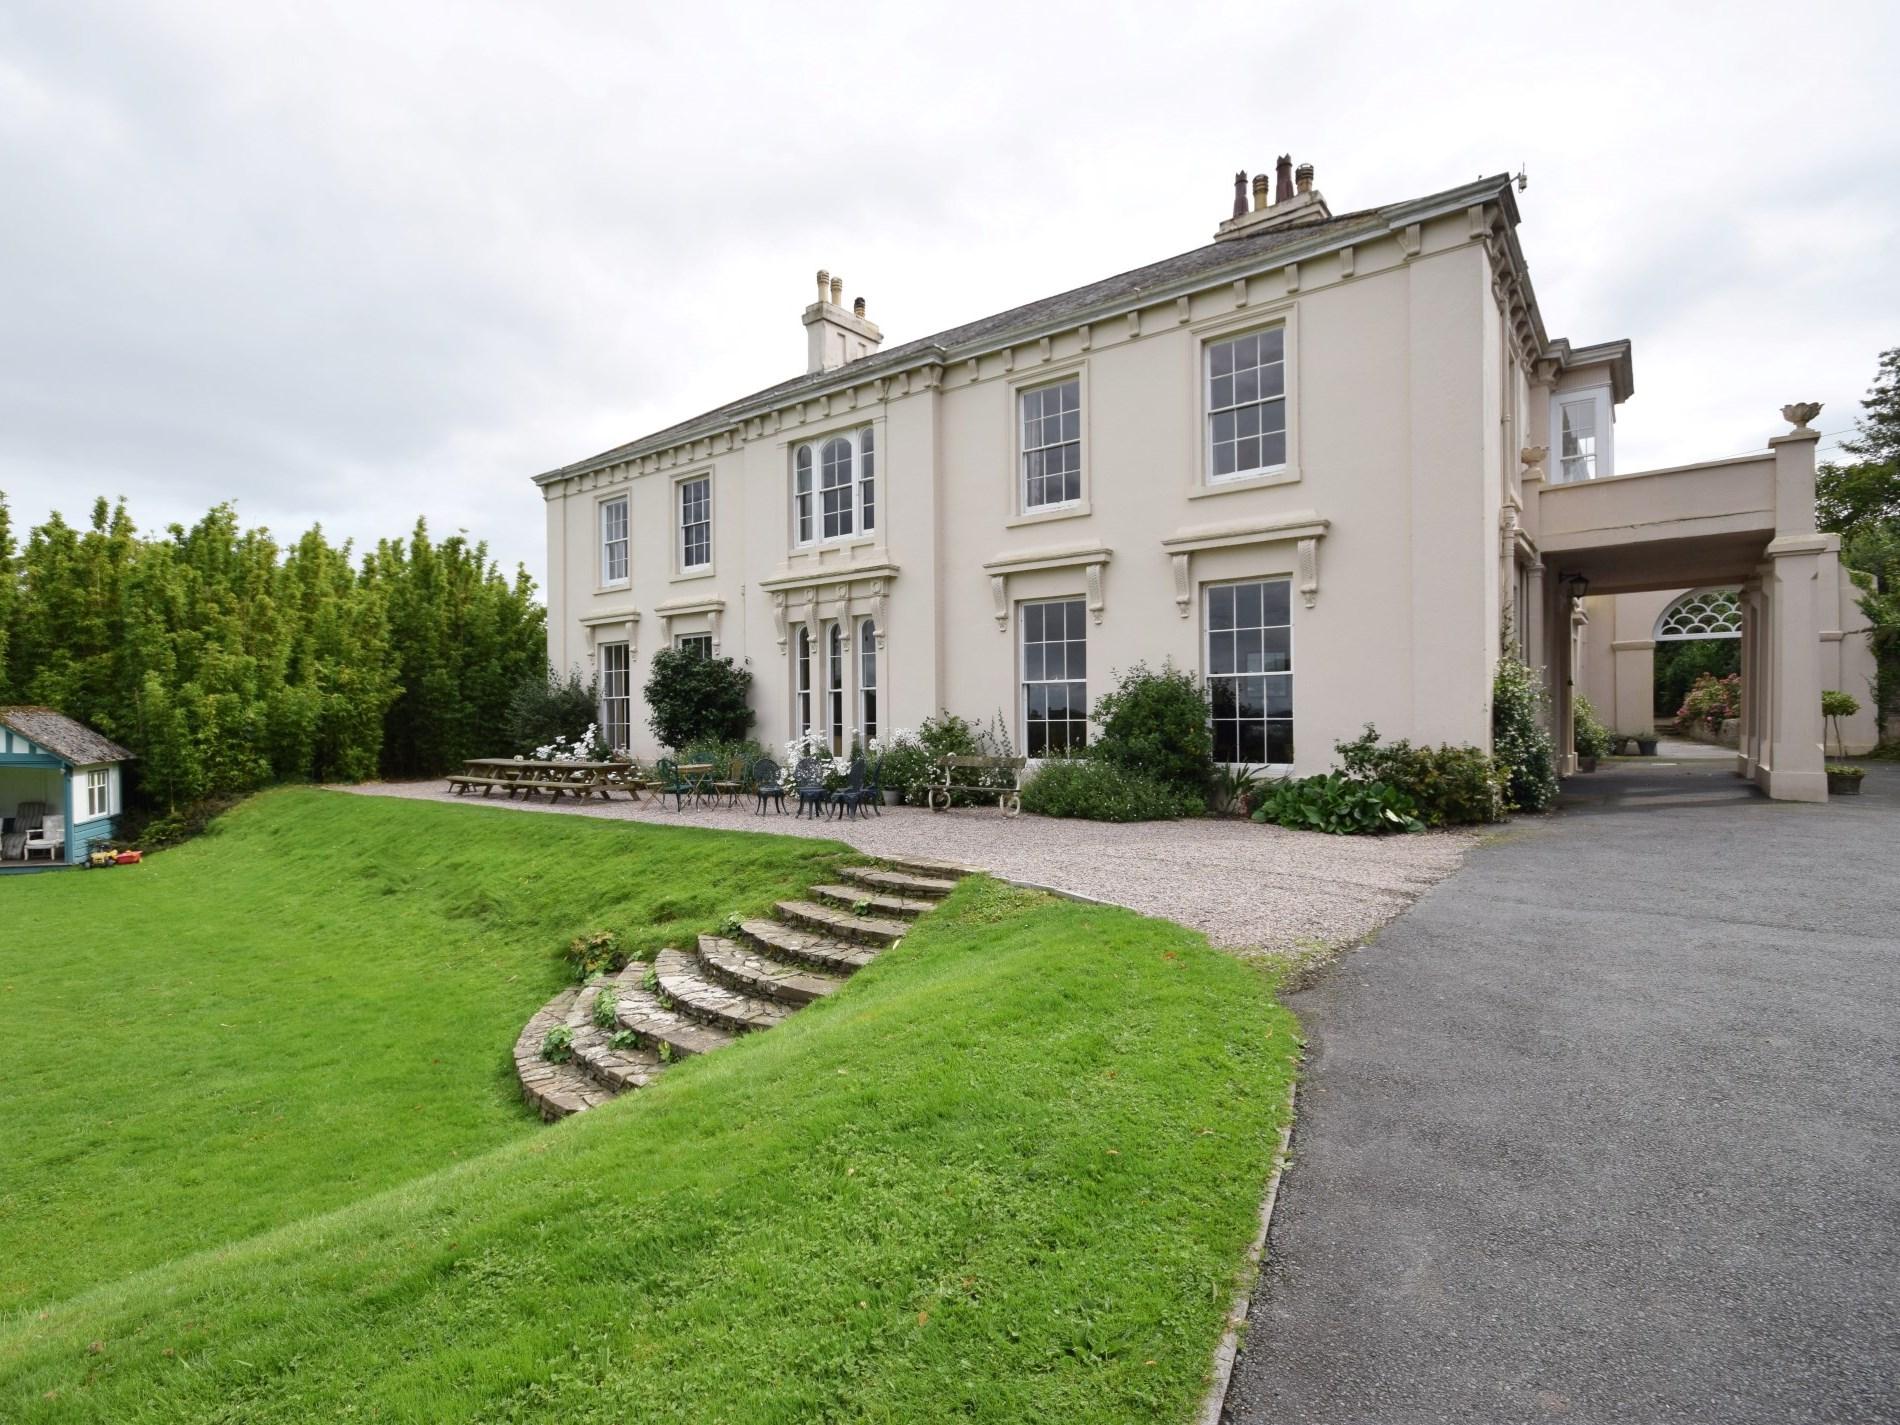 11 Bedroom Cottage in Bideford, Devon